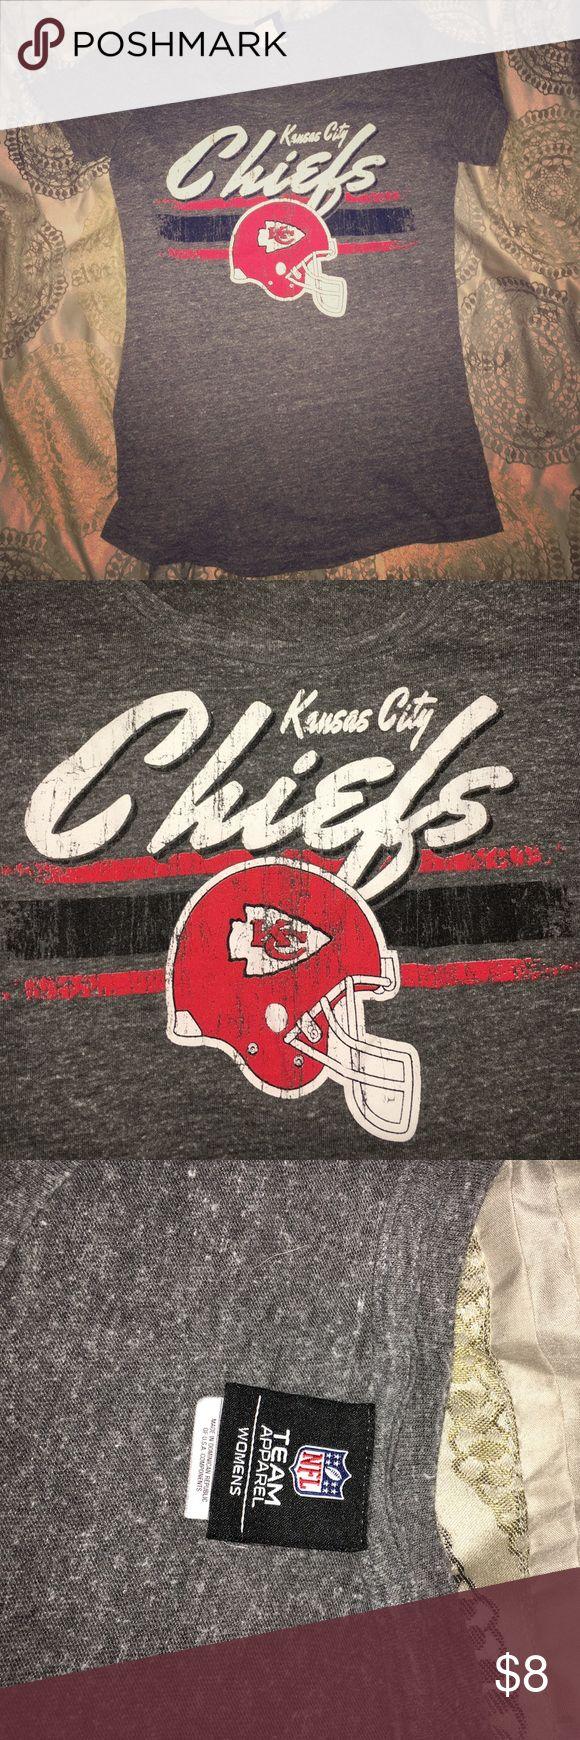 Shirt design kansas city - Gray Short Sleeve Kansas City Chiefs Womens Shirt Medium Gray Short Sleeve Shirt With Kansas City